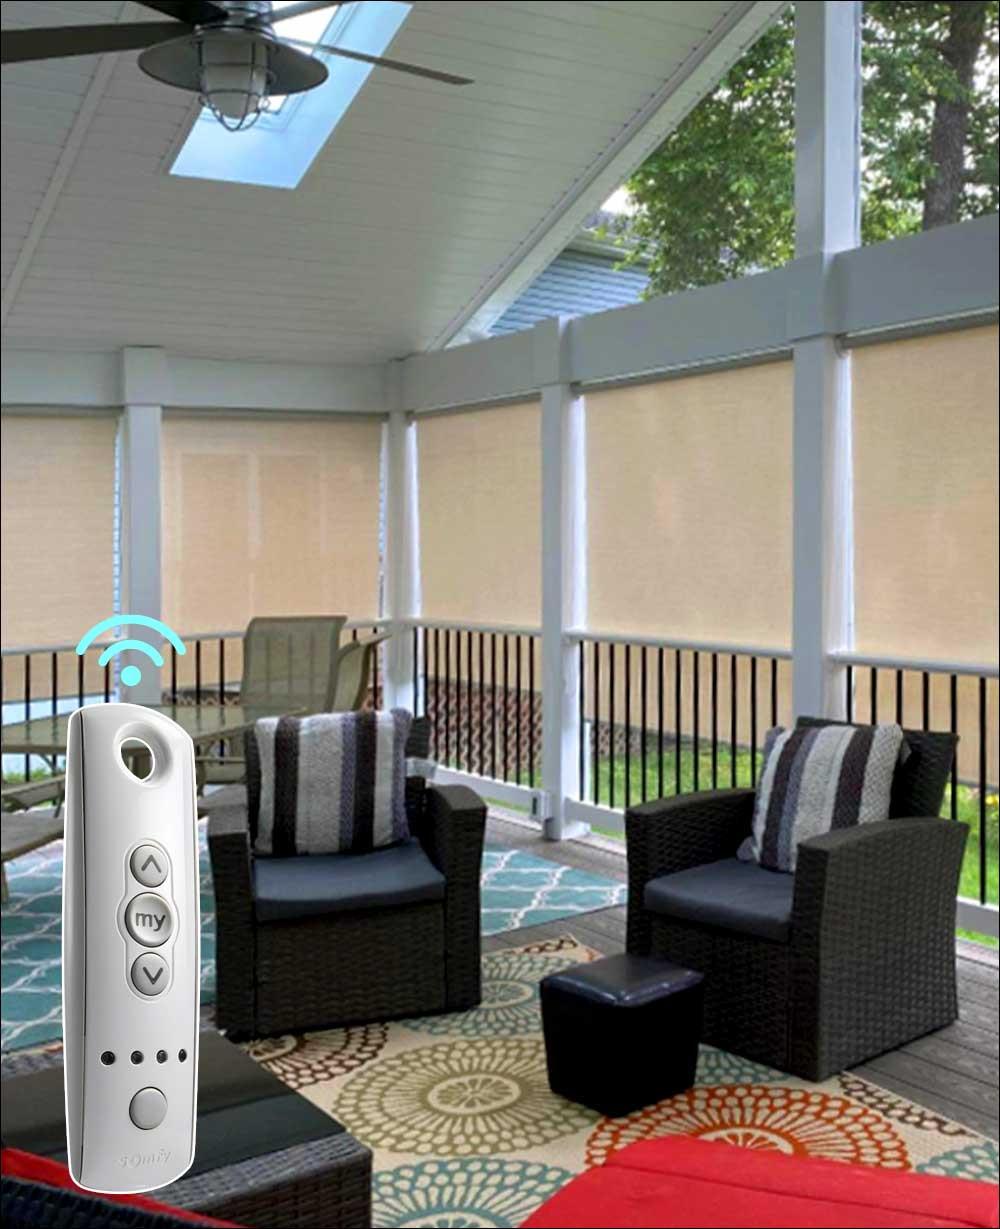 5 10 solar indoor outdoor motorized shades somfy smart home system